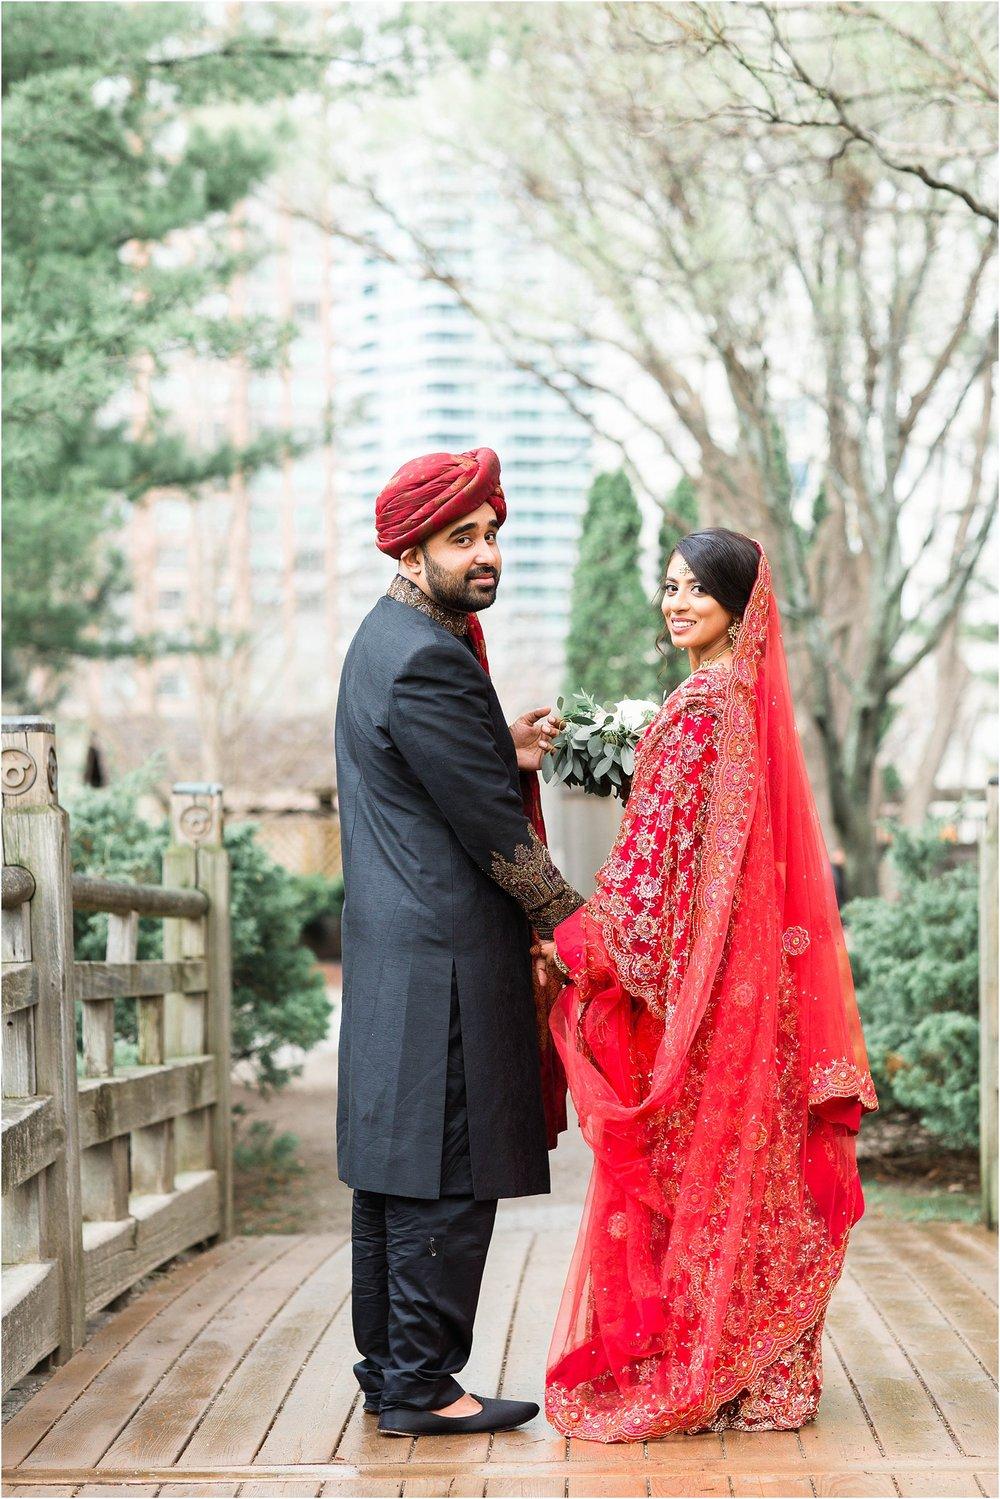 Jame-Masjid-Coopers-Mosque-Kariya-Park-Cherry-Blossoms-Wedding-Toronto-Mississauga-Brampton-Scarborough-GTA-Pakistani-Indian-Wedding-Engagement-Photographer-Photography_0051.jpg